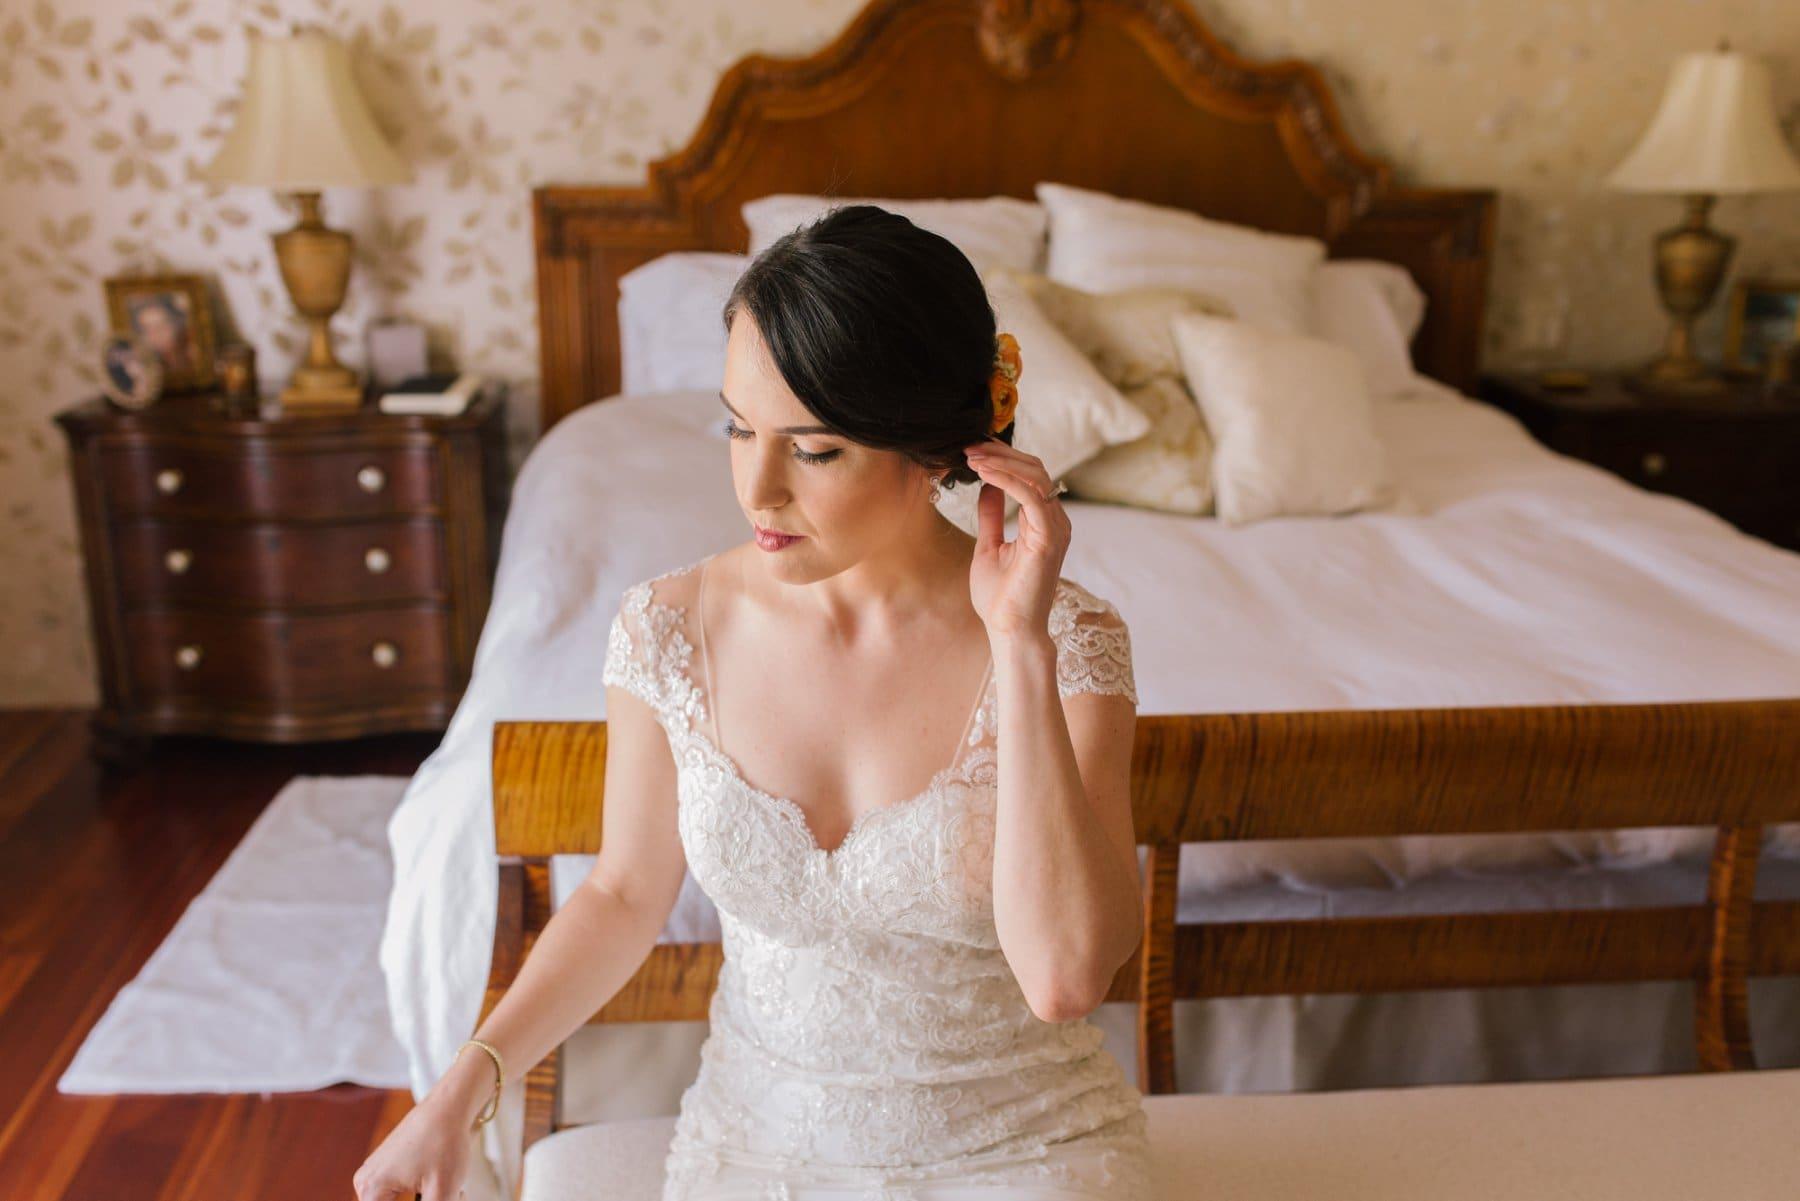 bride getting ready in home Arizona wedding photos